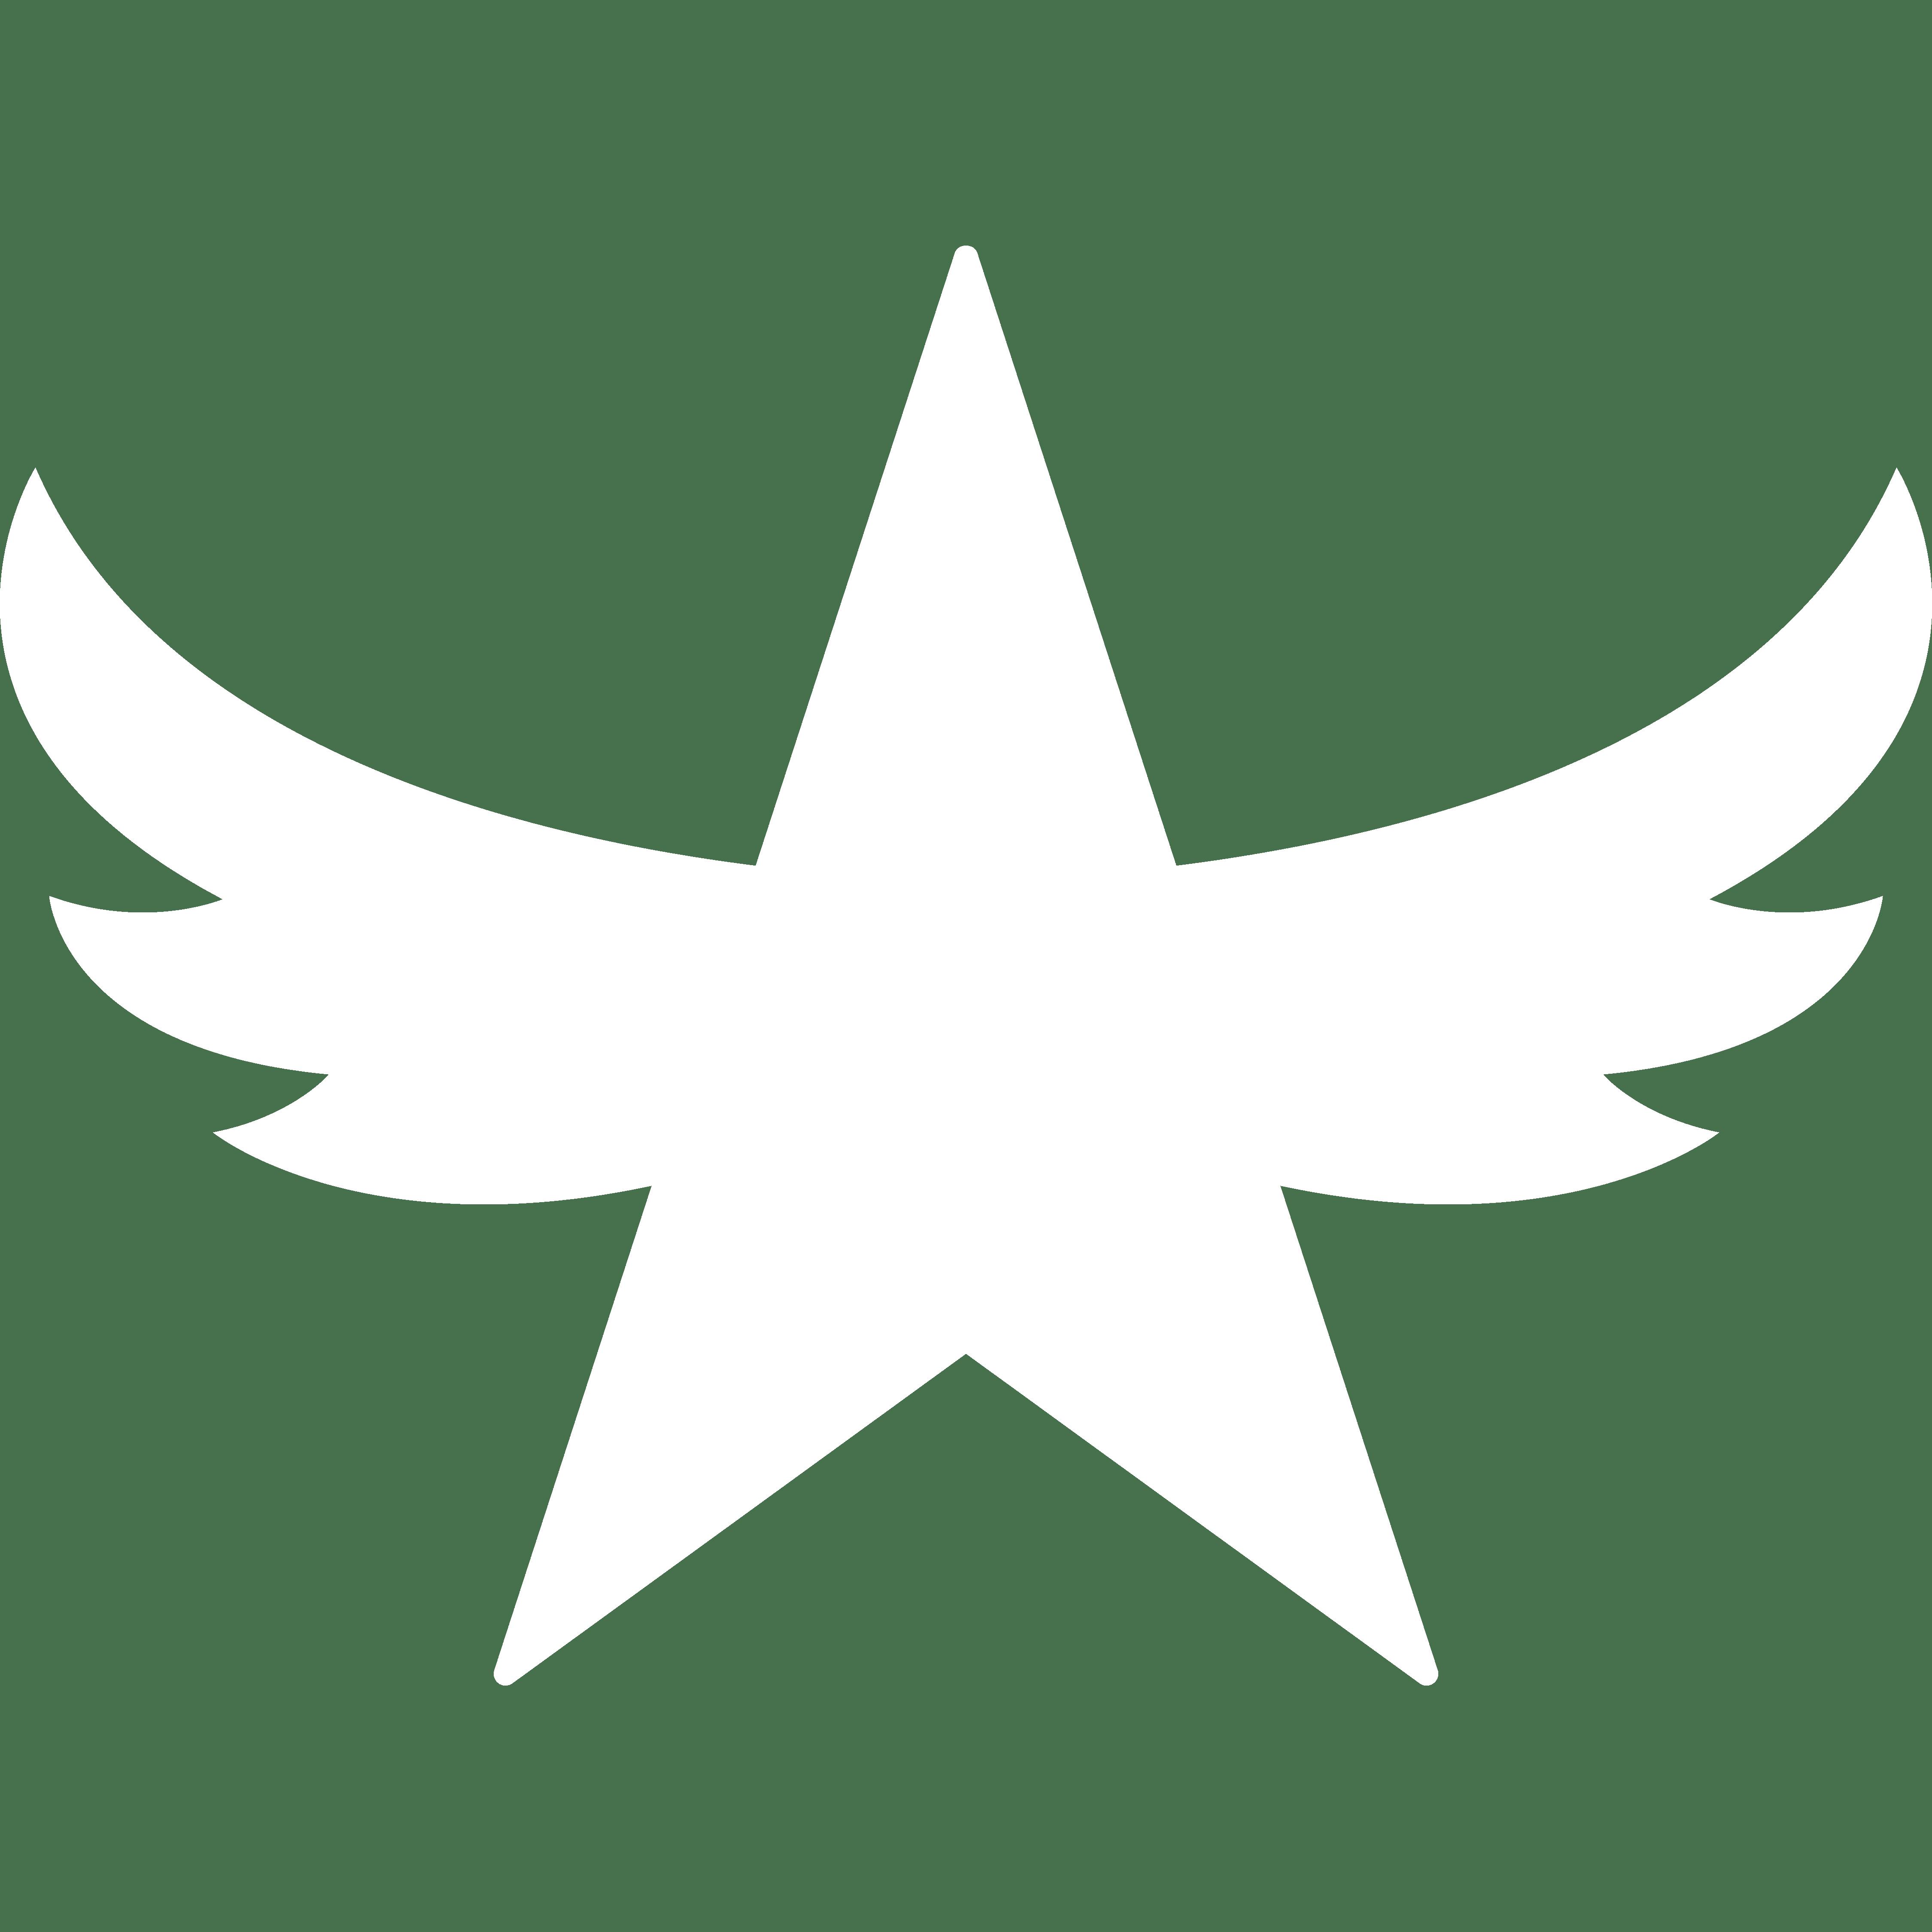 Brightwing Star Logo